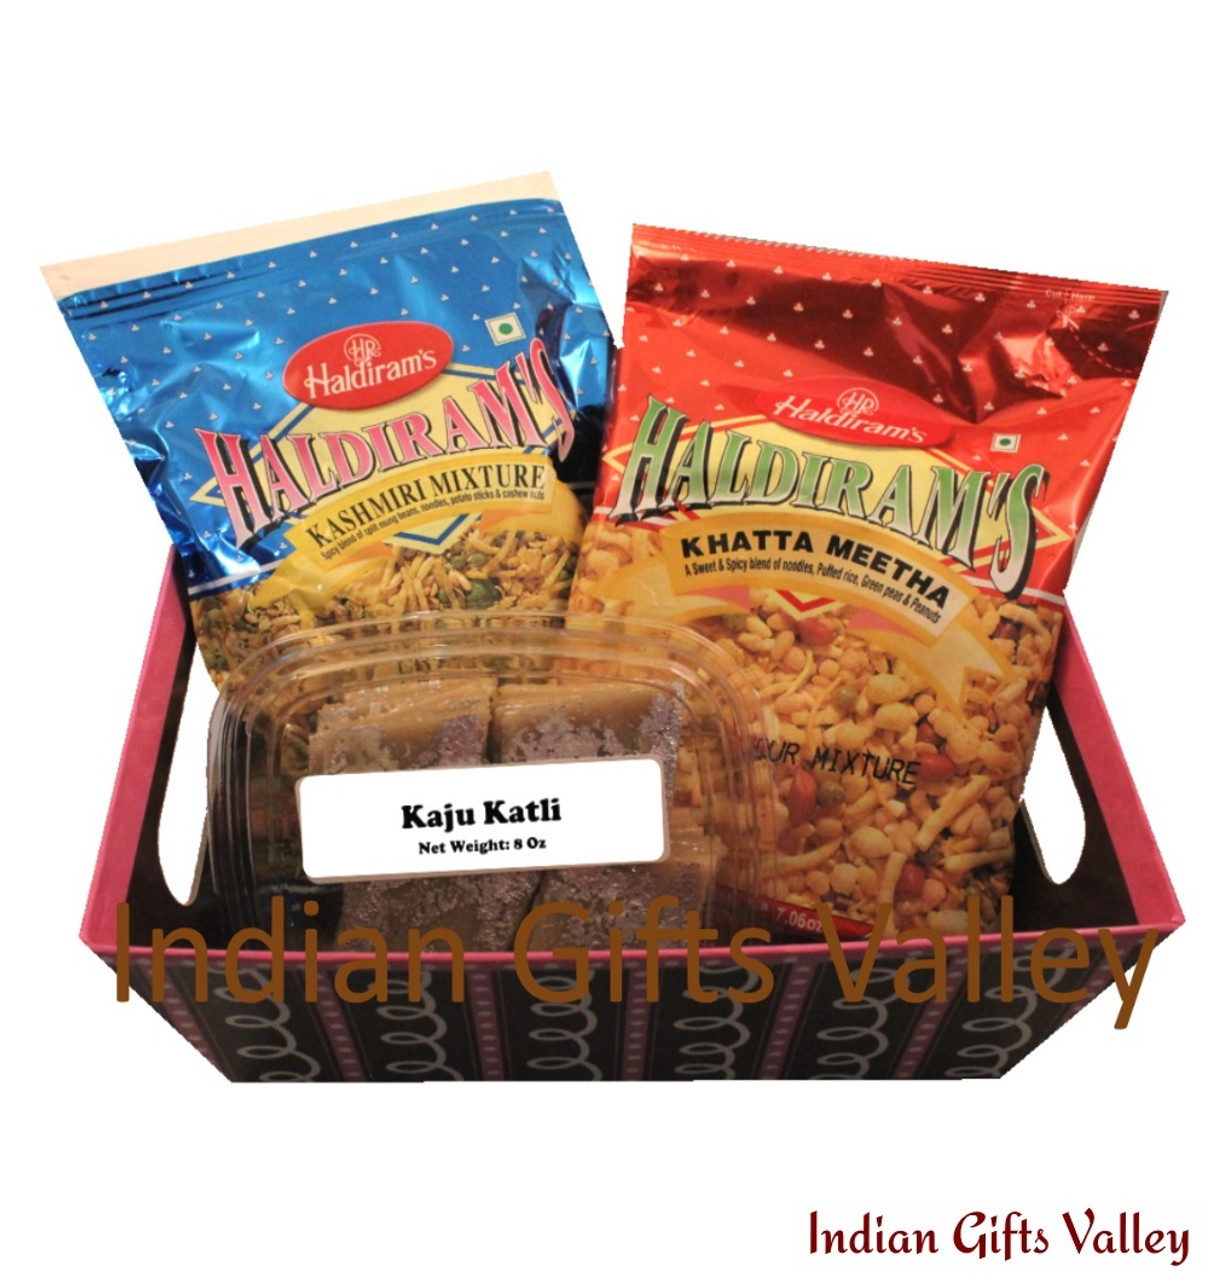 Diwali bhaidooj gift hamper 4 diwali diyas with haldiram soan gift hamper kaju katli haldiram namkeens in a beautiful basket negle Gallery